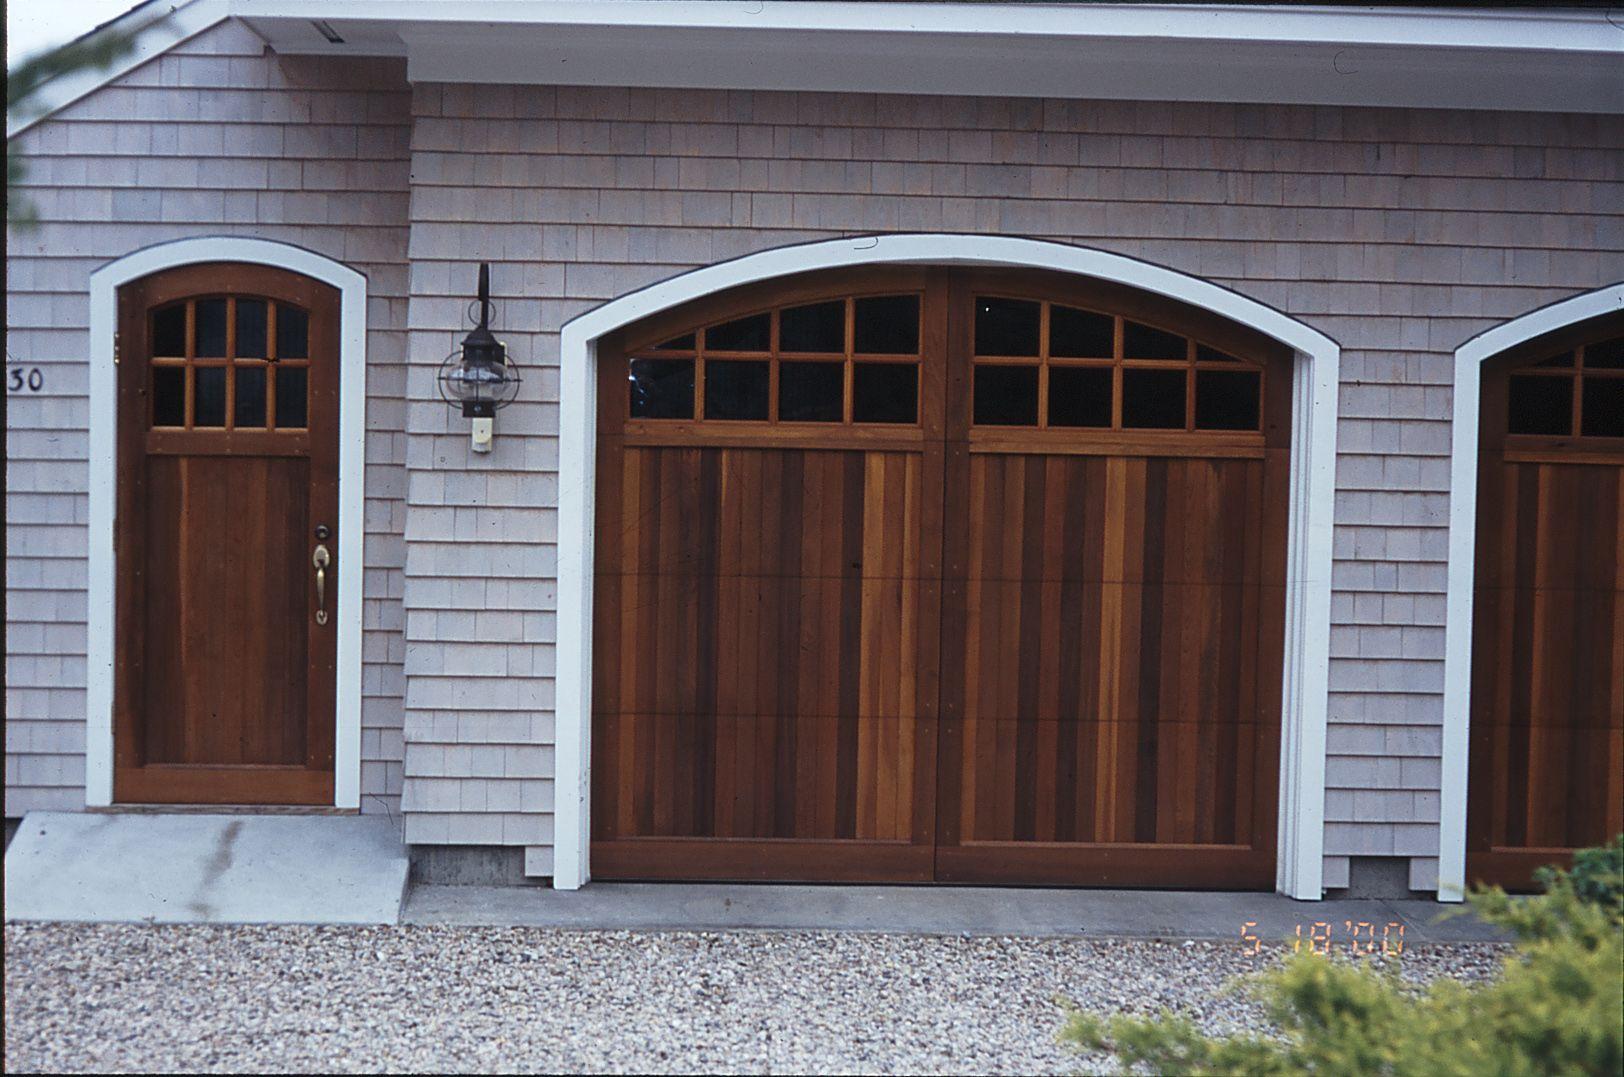 single garage doors with windows. two single garage doors, stained dark, curved top with windows, vertical v- doors windows